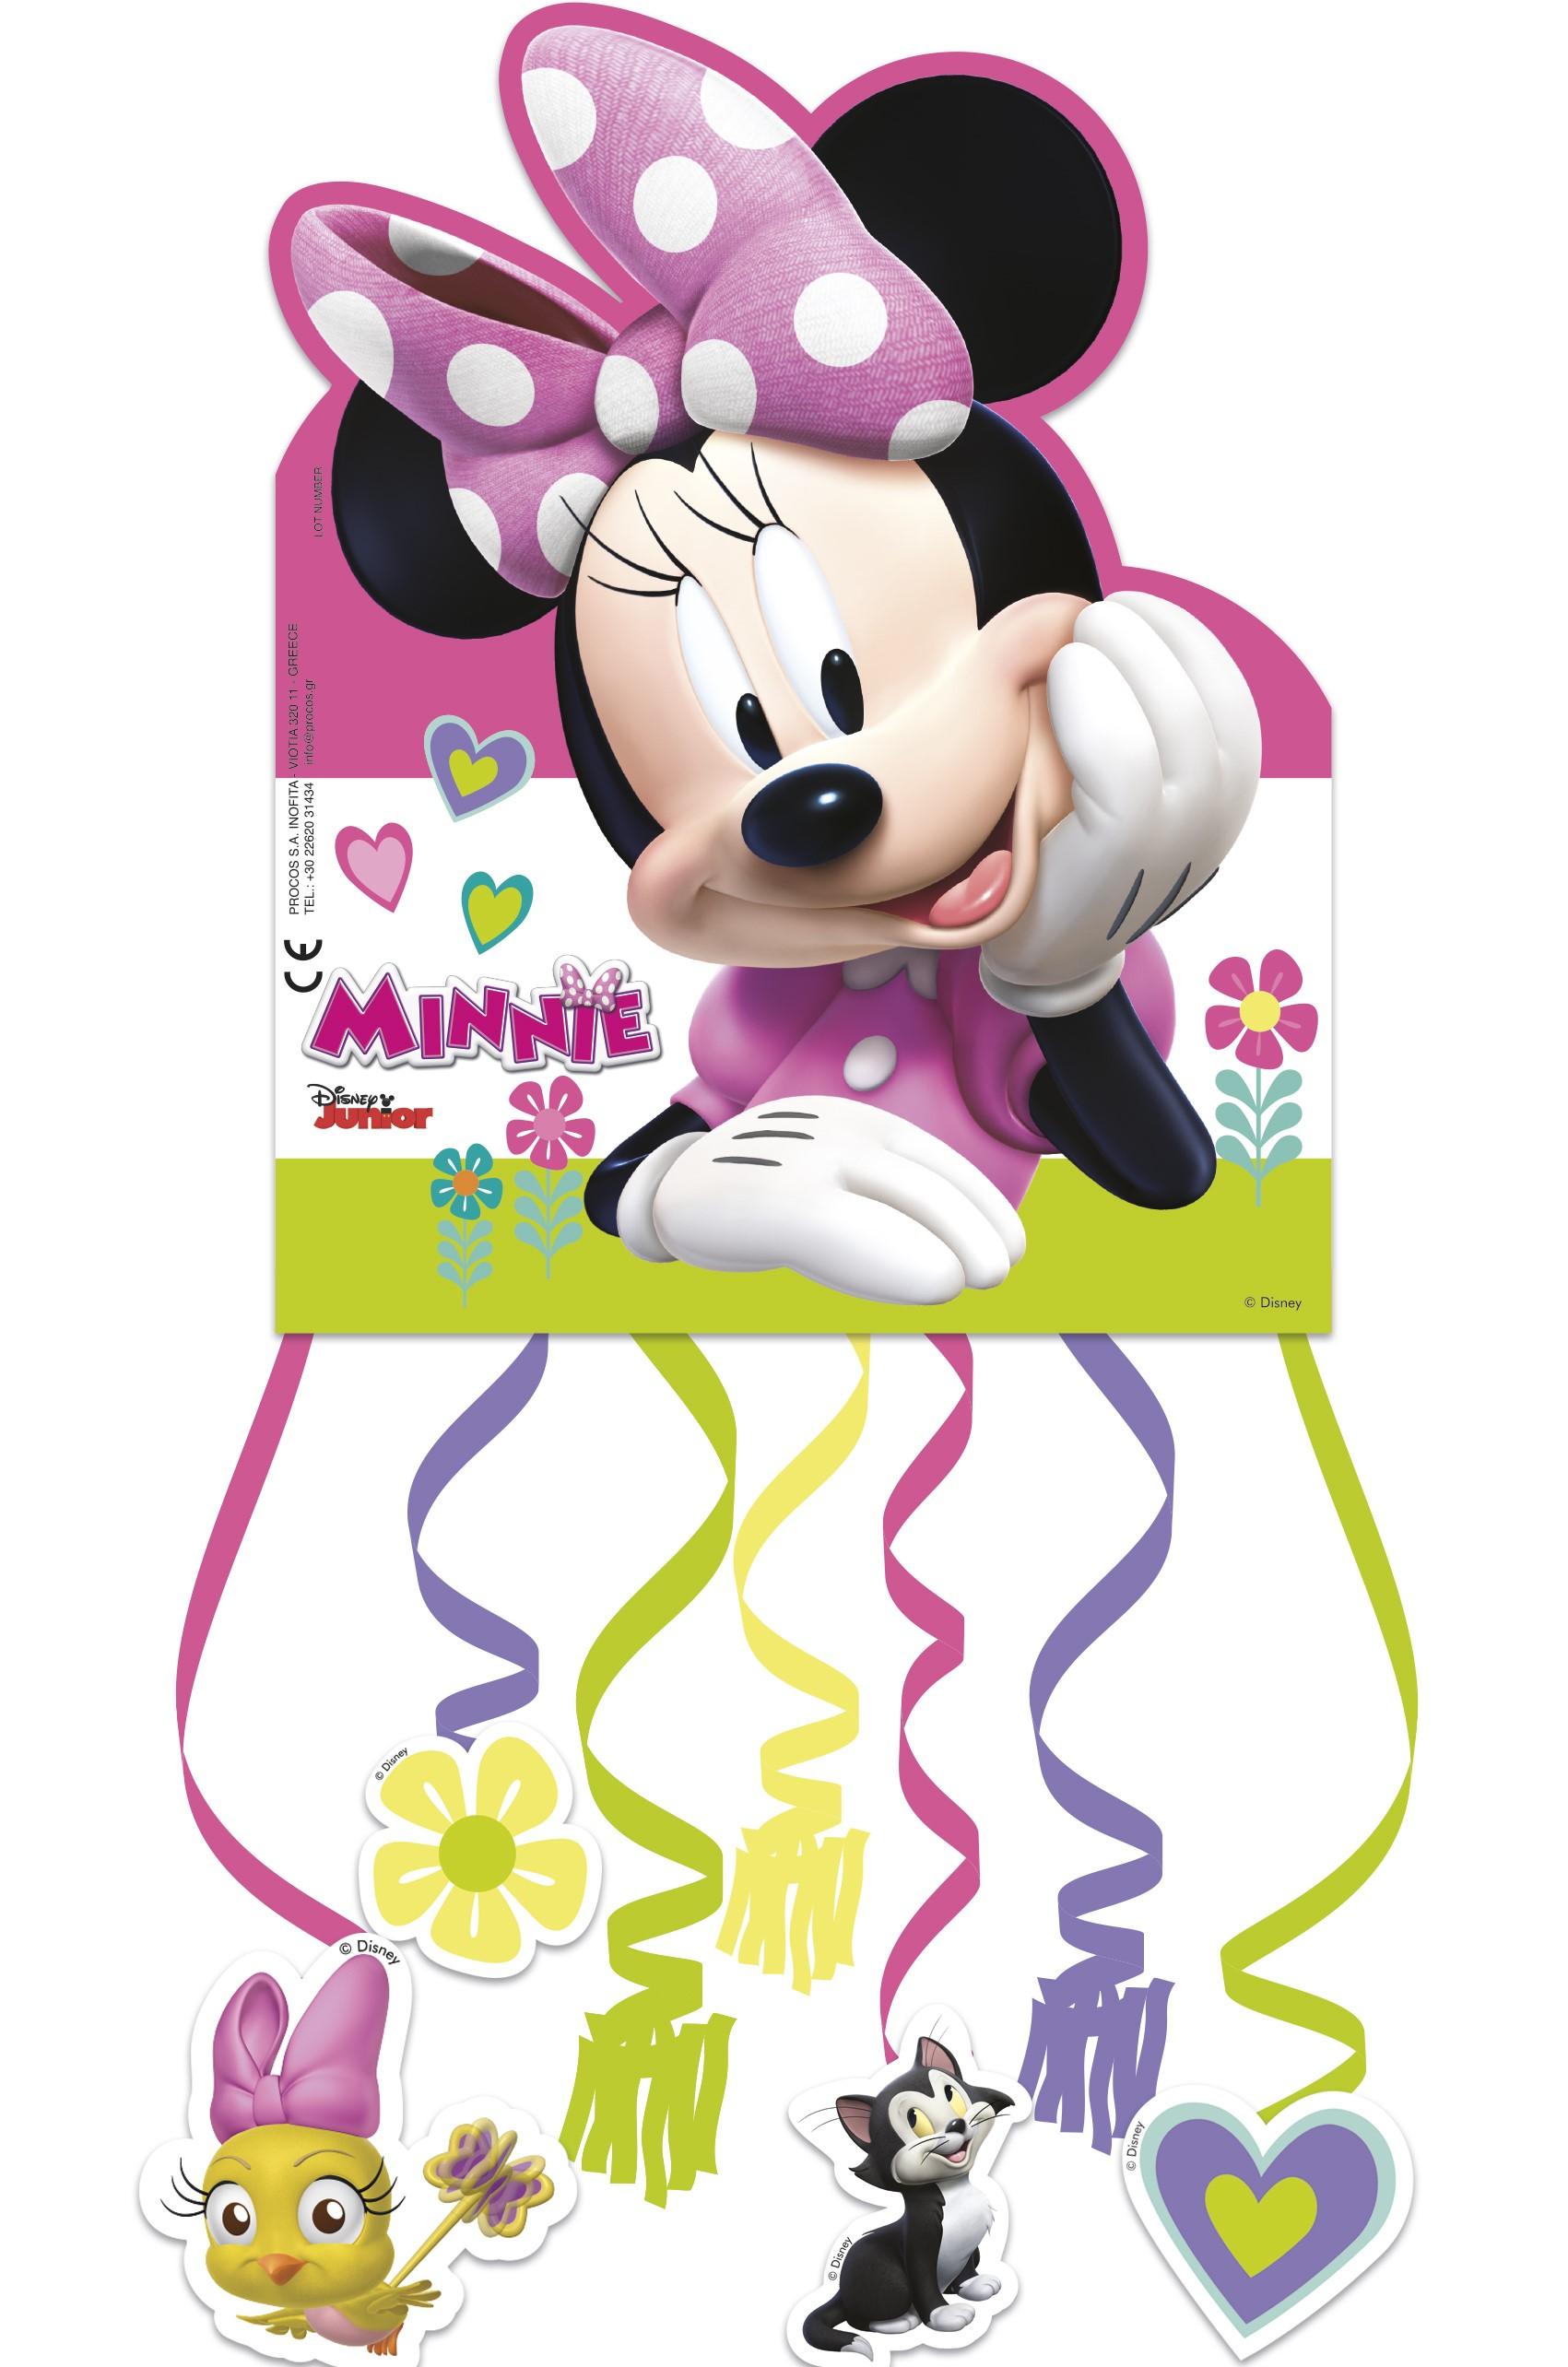 Piňata Minnie Mouse Procos